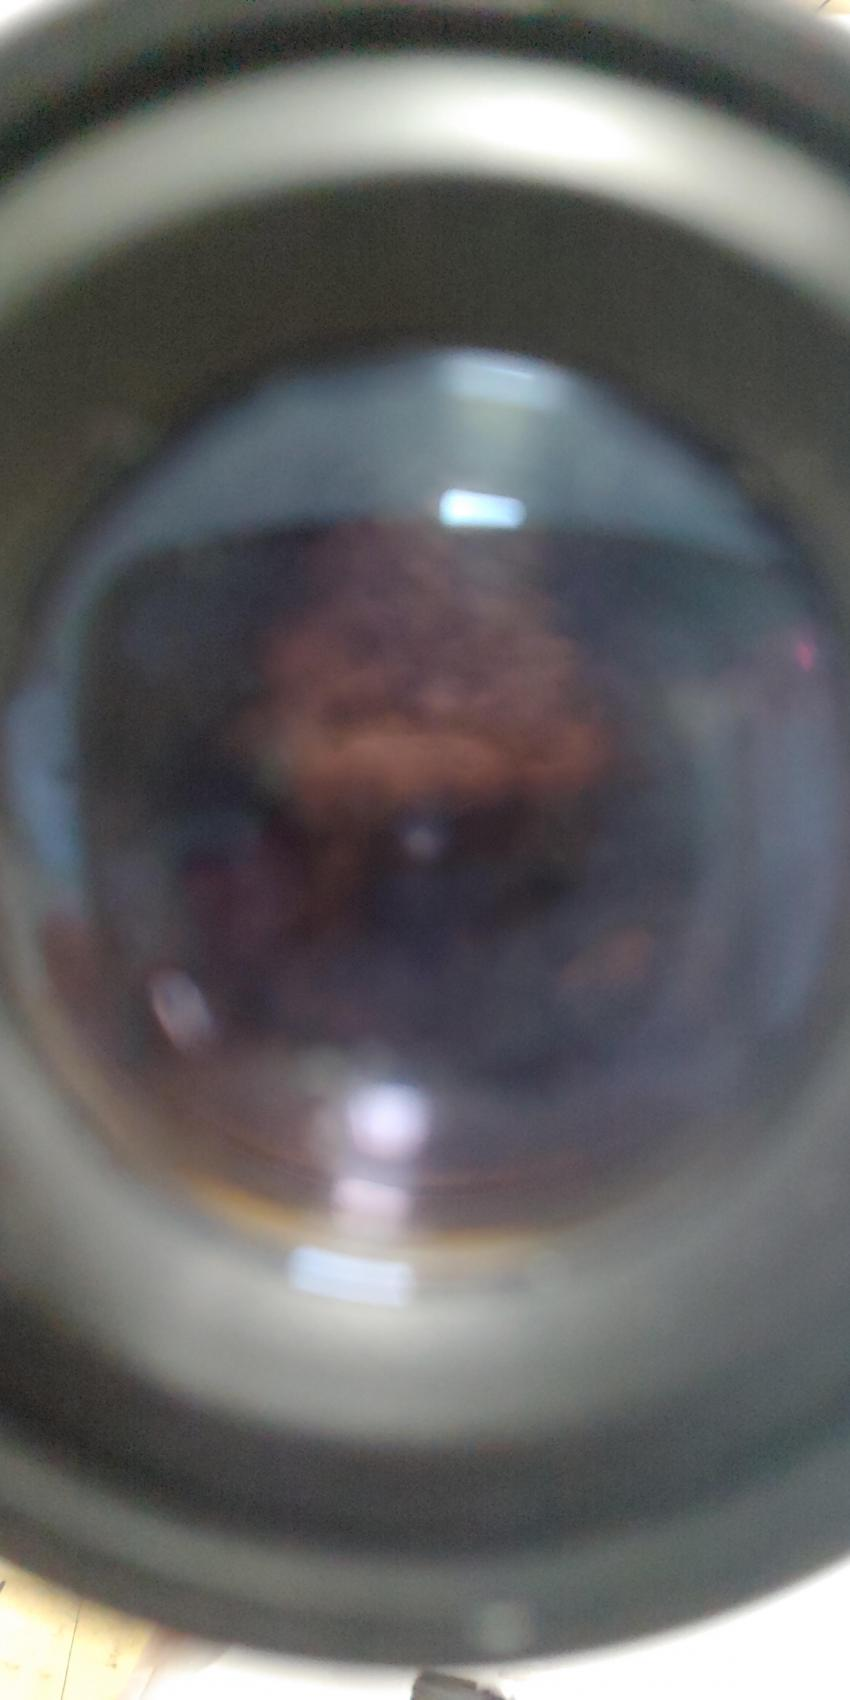 viewimage.php?id=26b4ca33ebd339af&no=24b0d769e1d32ca73cec84fa11d028316f6e59db3d00f81430124c7066e696516e635e01eca9cc917950ba5c9756c2a471f7f7e11328c2eac80151b6857bb338004df9